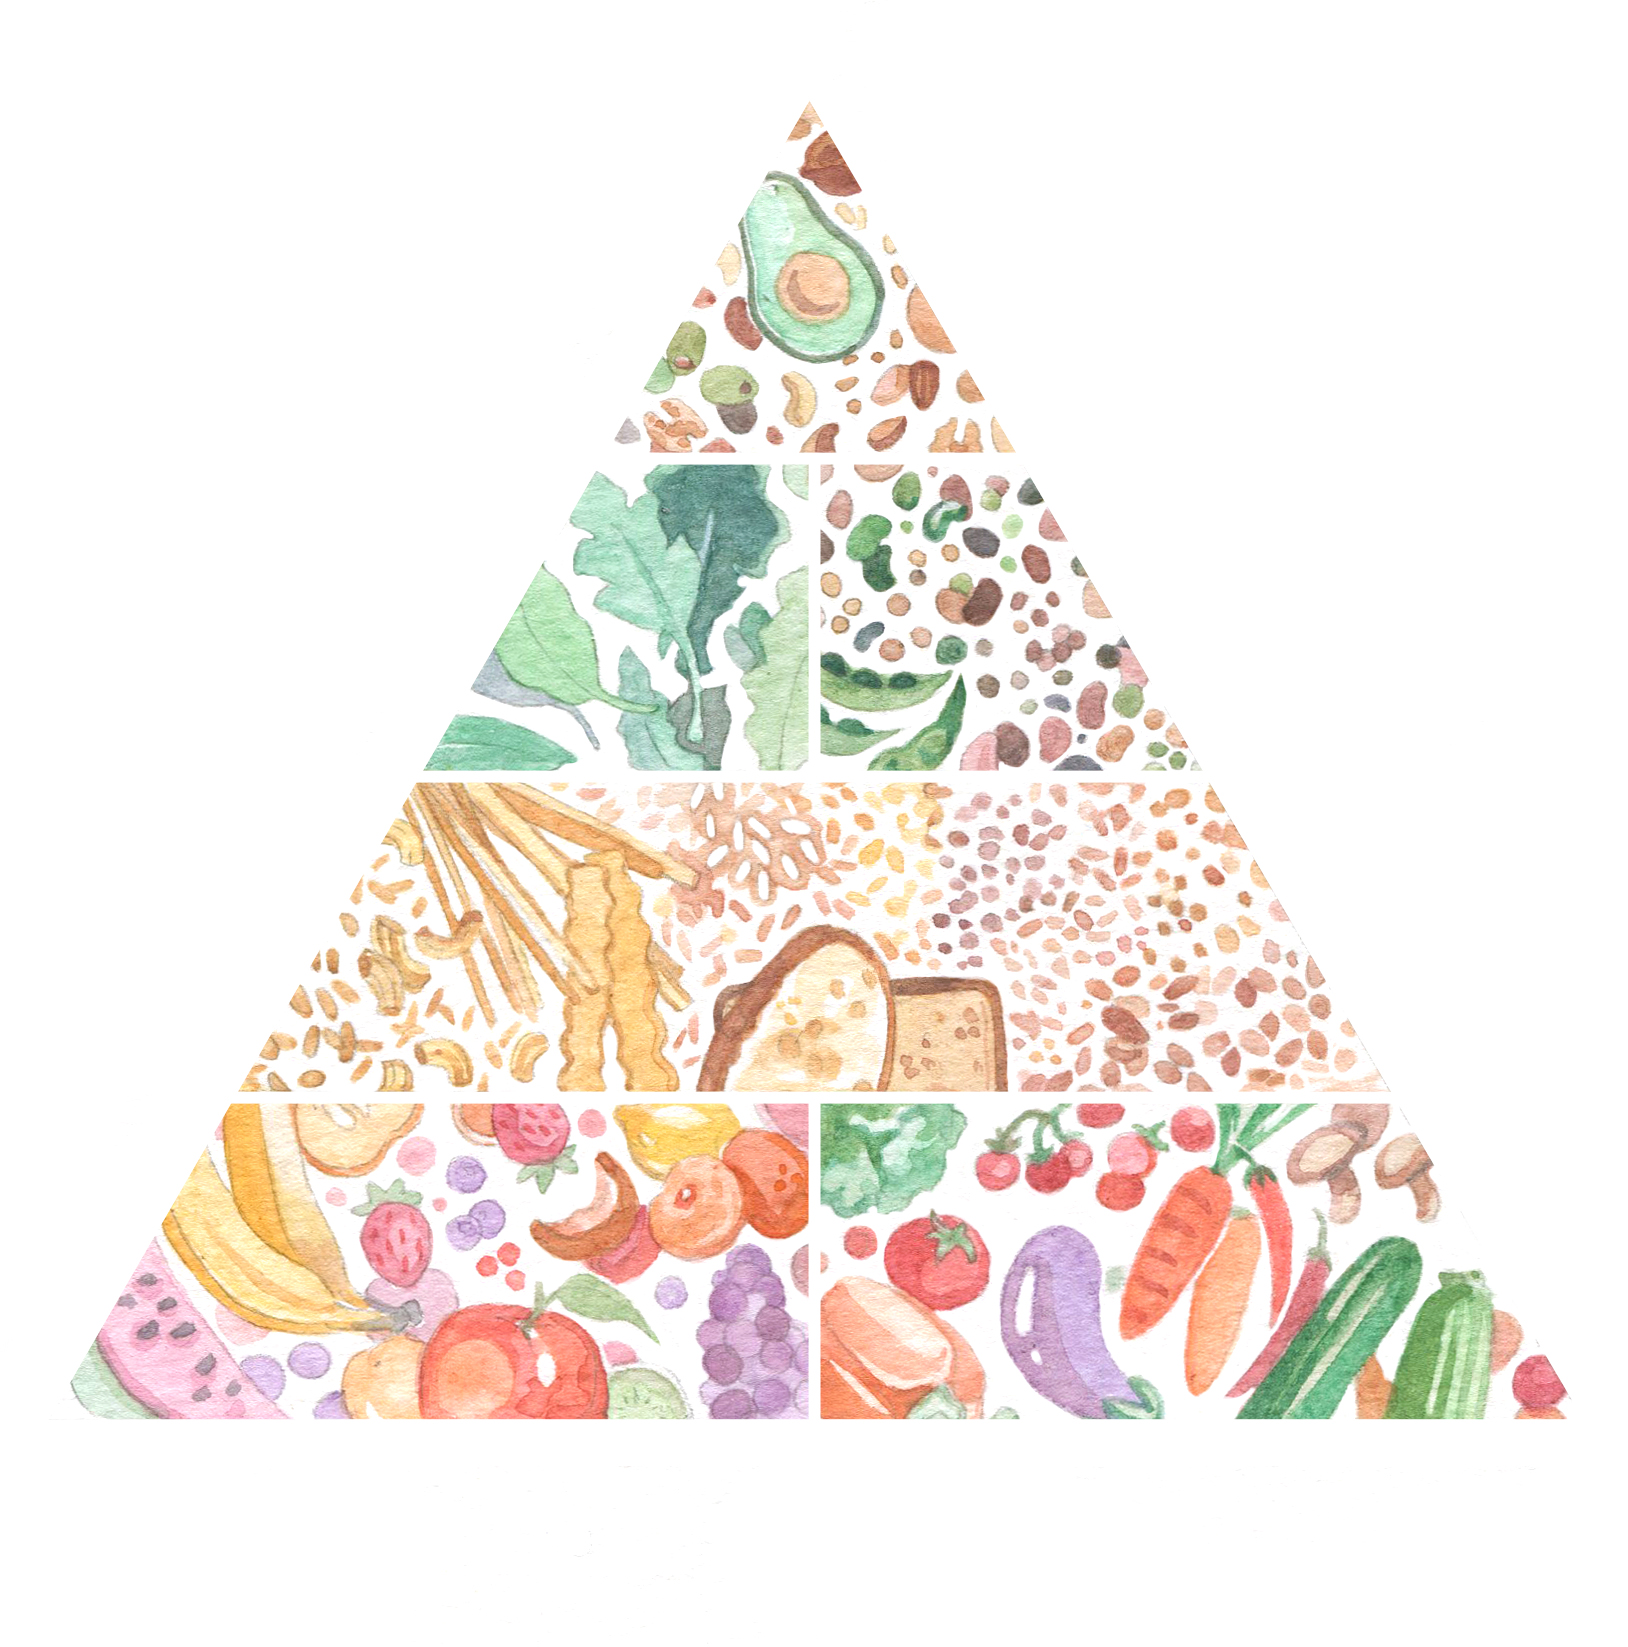 vegan-foodpyramid.JPG